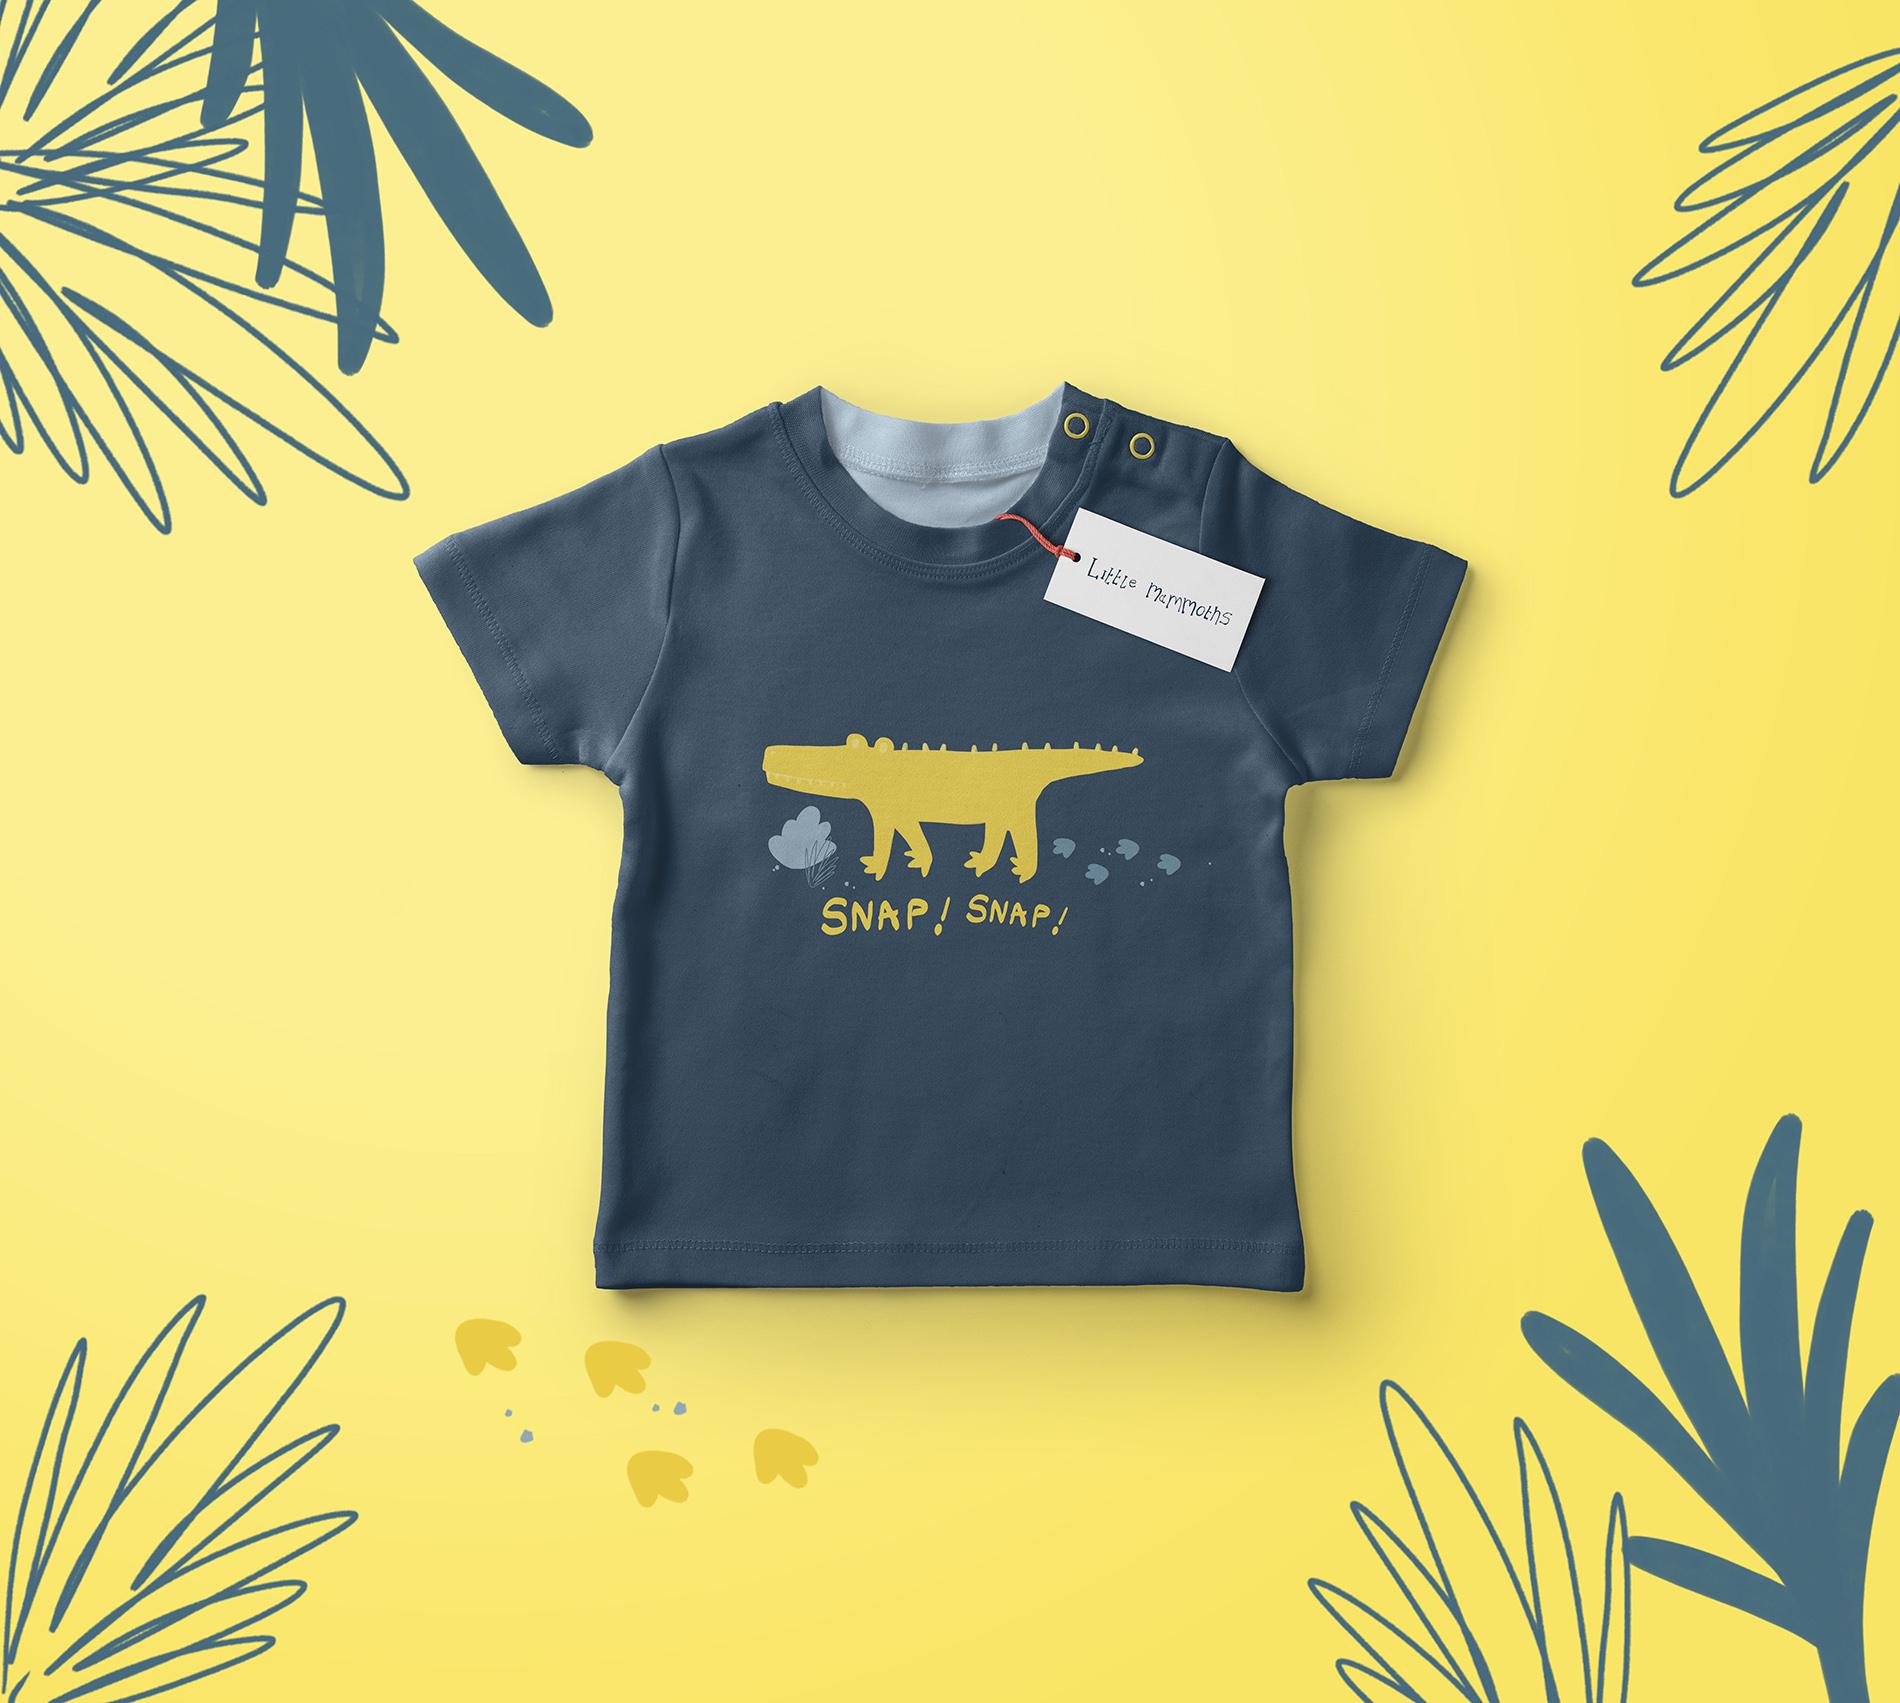 Kids Mock Up T-shirt